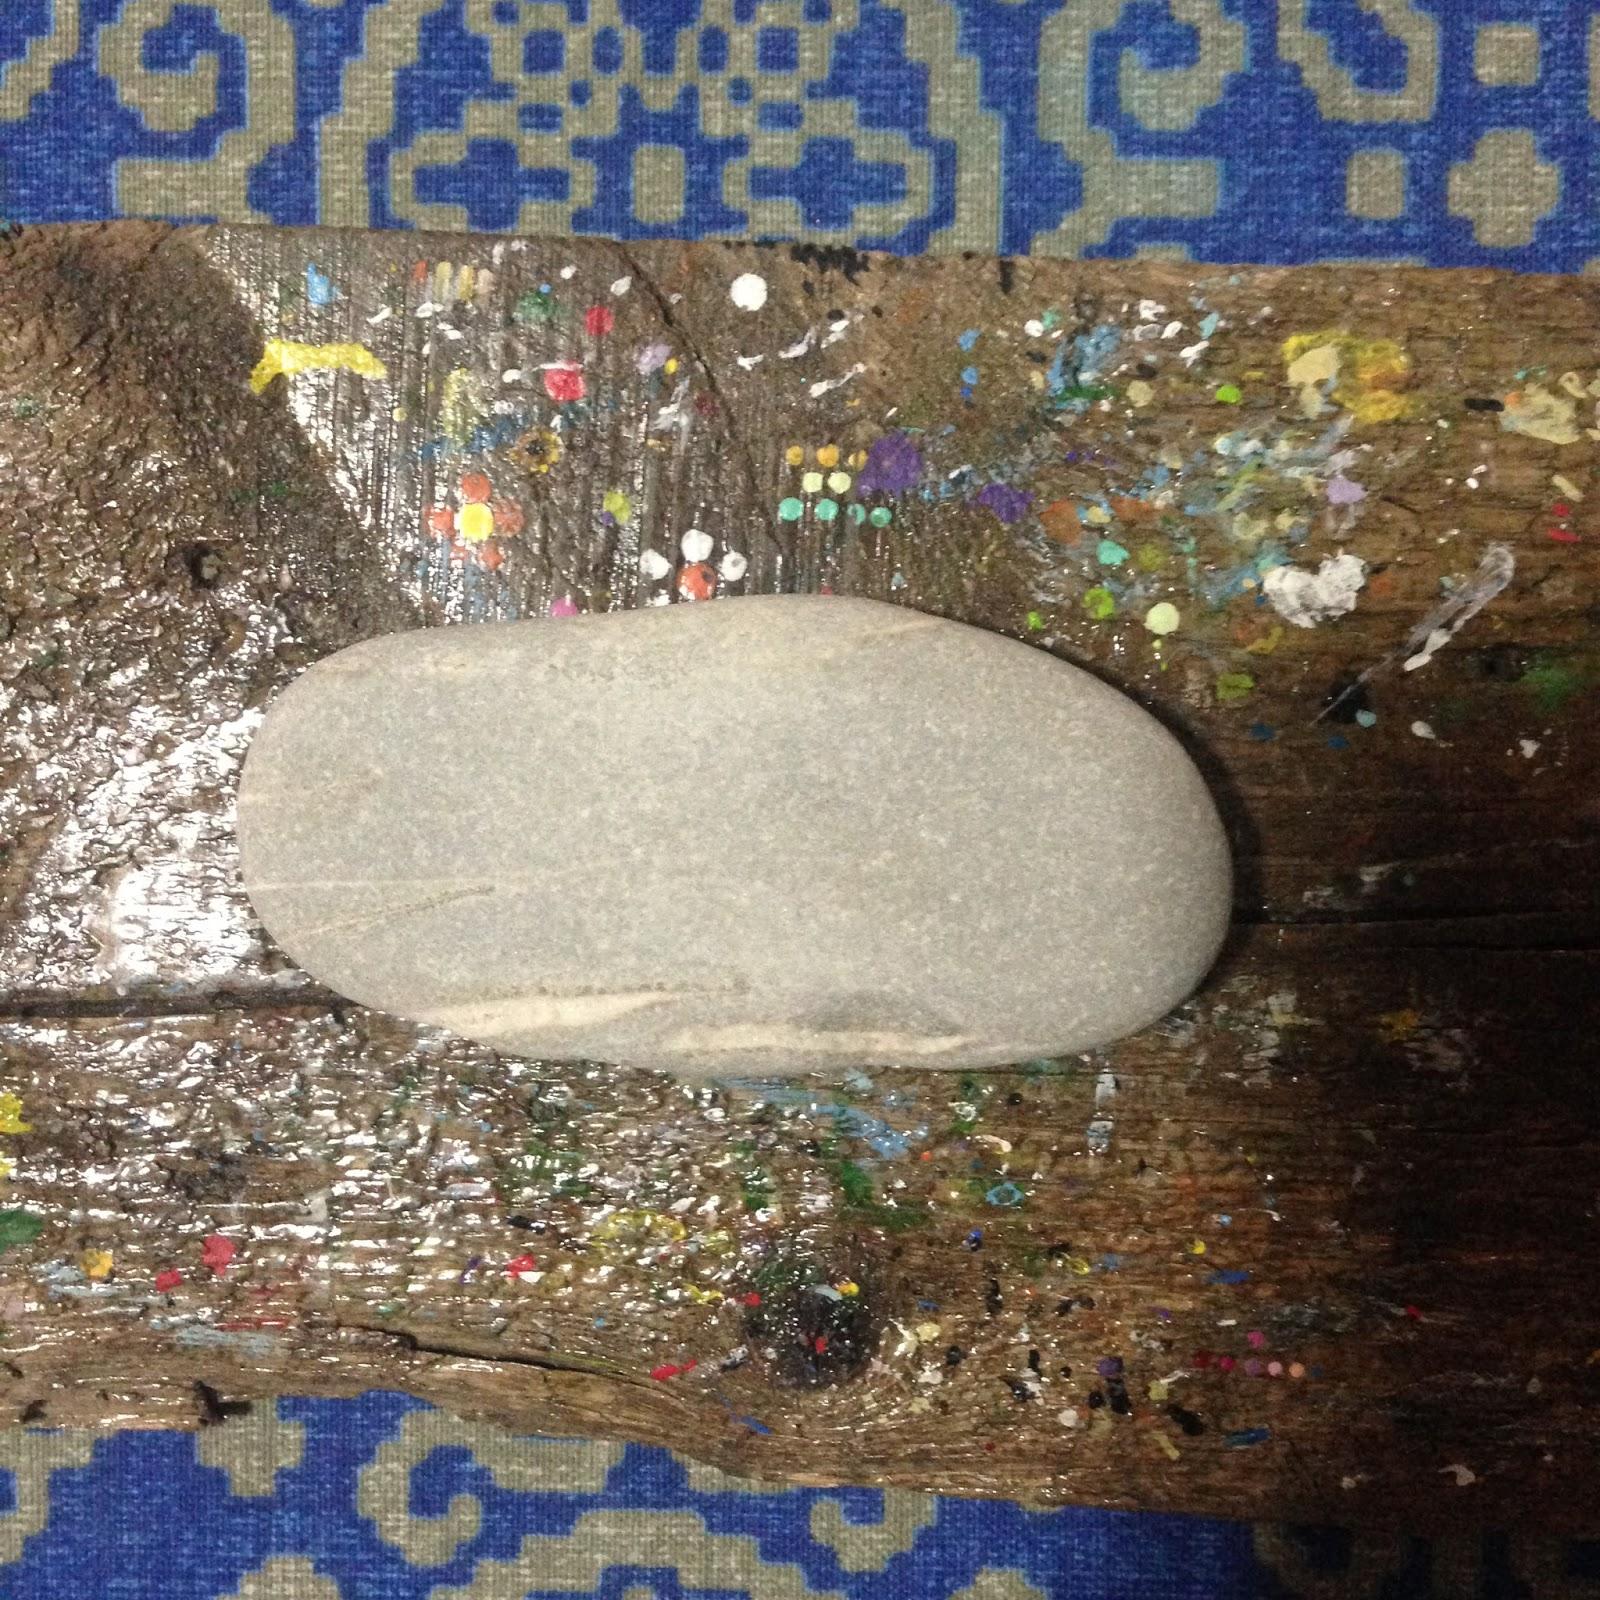 Tas Boyama Stone Painting Kus Cenneti